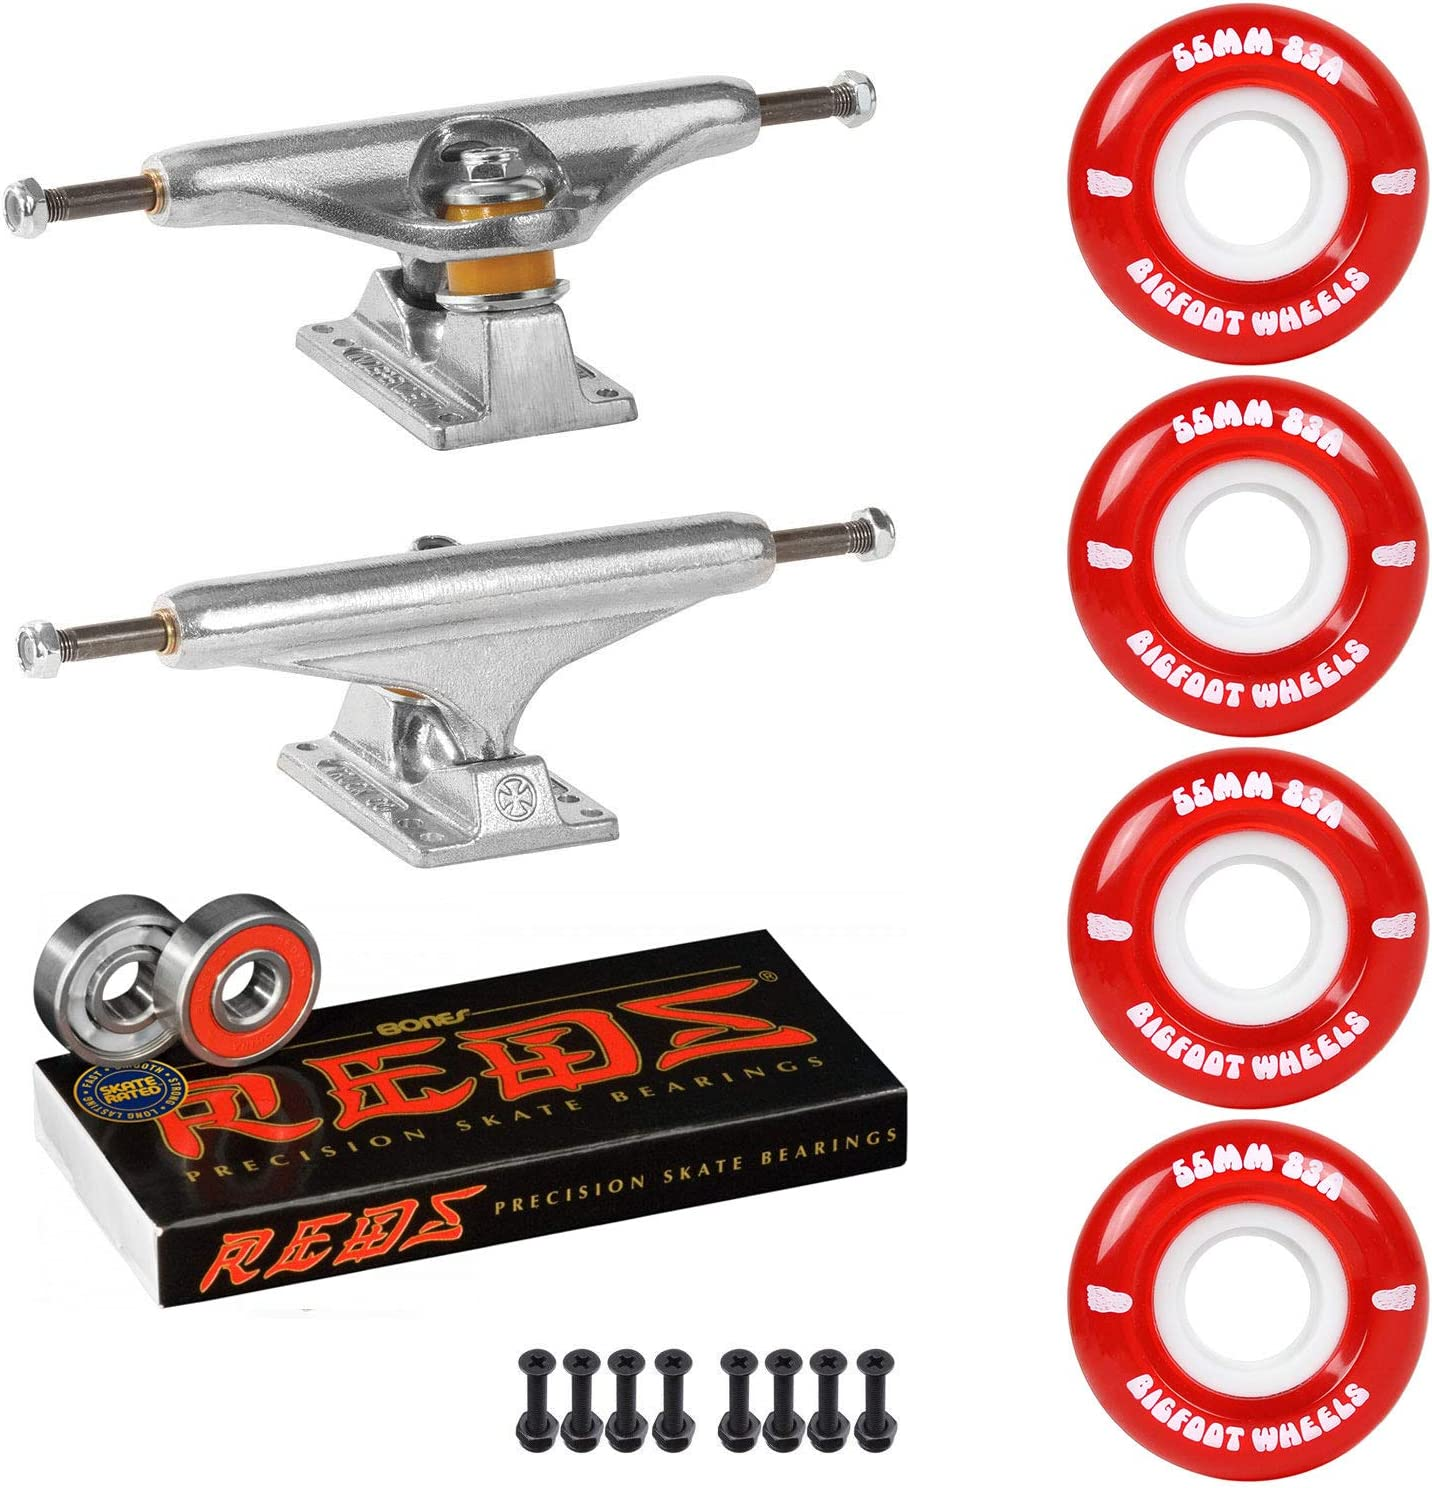 Independent Trucks Skateboard 83A Cruiser Dedication Max 69% OFF Bones Wheels R Package